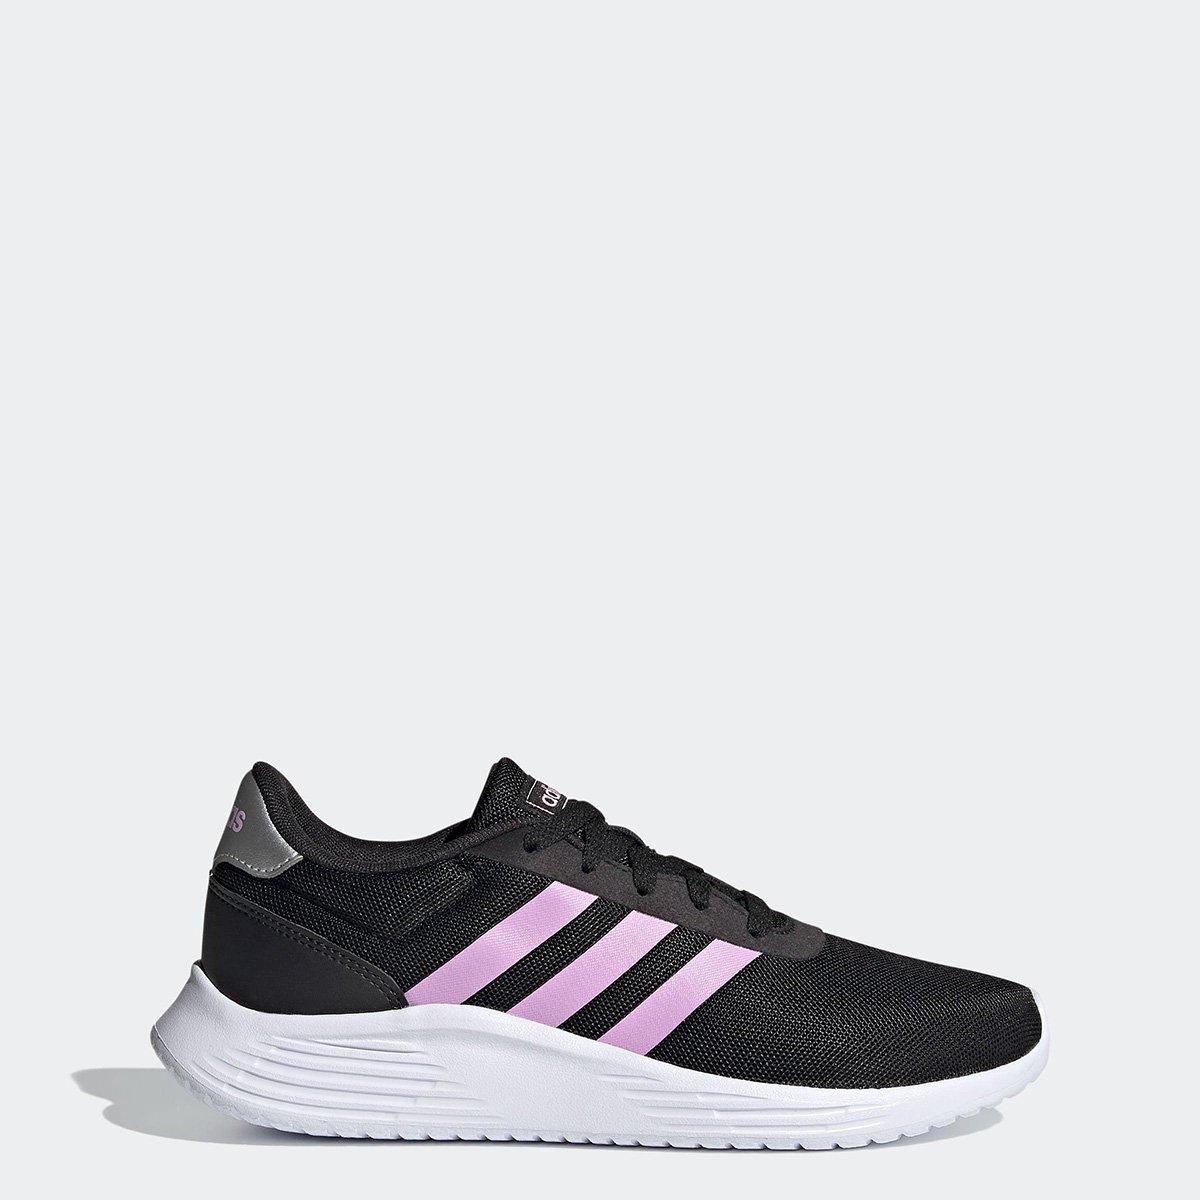 Tênis Adidas Lite Racer 2.0 Feminino - Preto+Off White